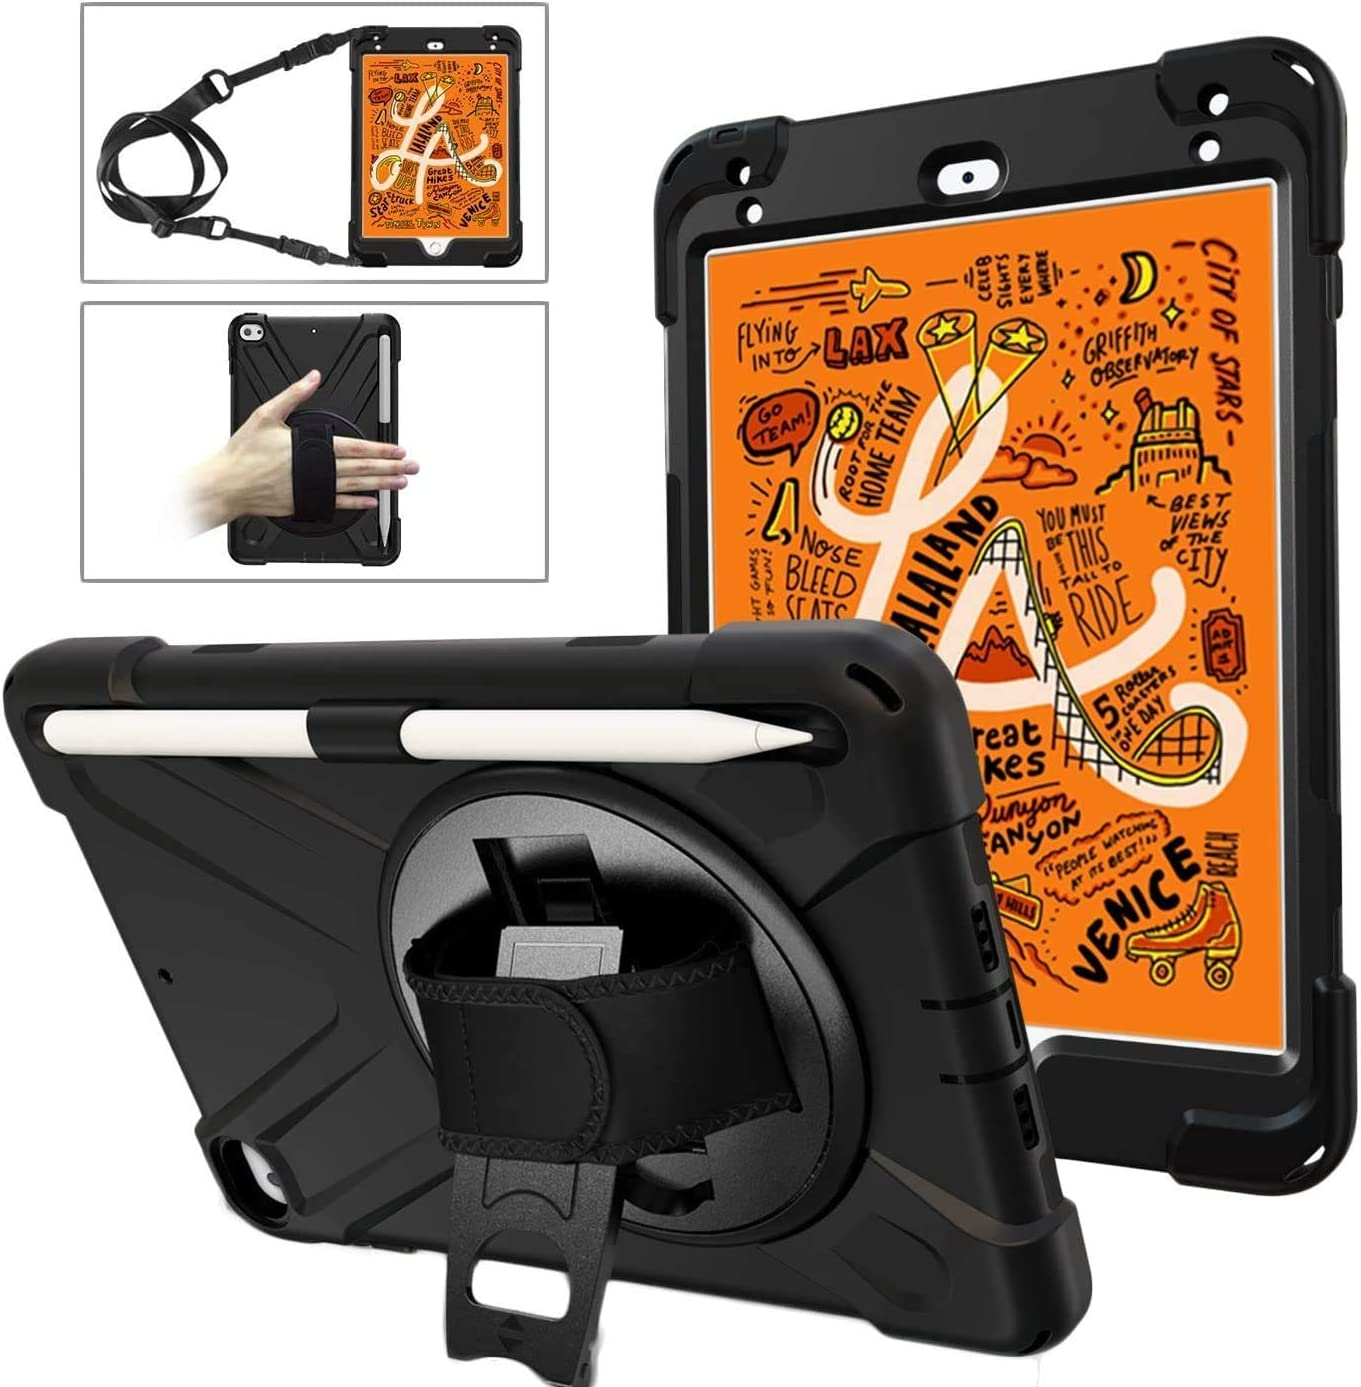 Herize Funda iPad Mini 4 con Porta Lápiz | Funda iPad Mini 5 para Adulto | Híbrido Cases de la Cubierta a Prueba de Golpes Carcasa | Correa para Hombro de Mano Giratoria 360 para iPad Mini 5/4 | Negro